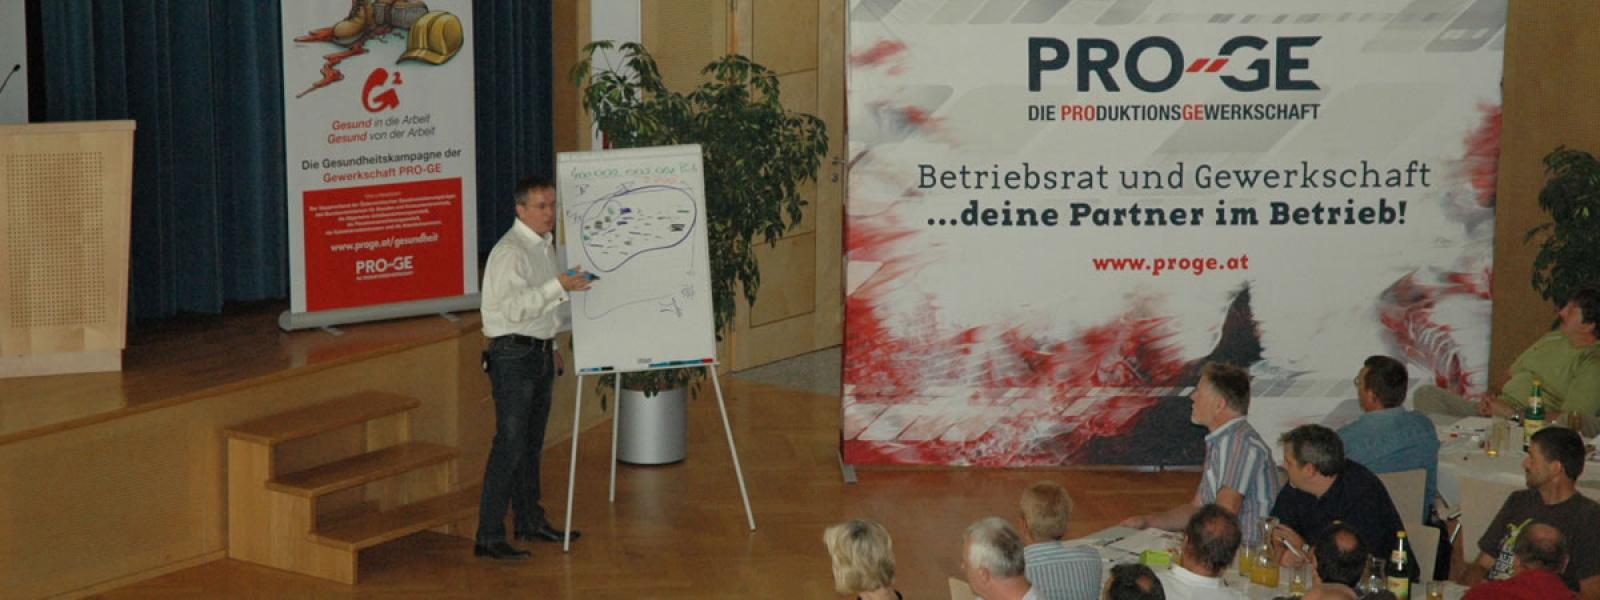 4a Einsiedlerweg Büro im OG, Mattsee, 5163, ,Mentaltraining,Training/Seminare,Einsiedlerweg,1,1000